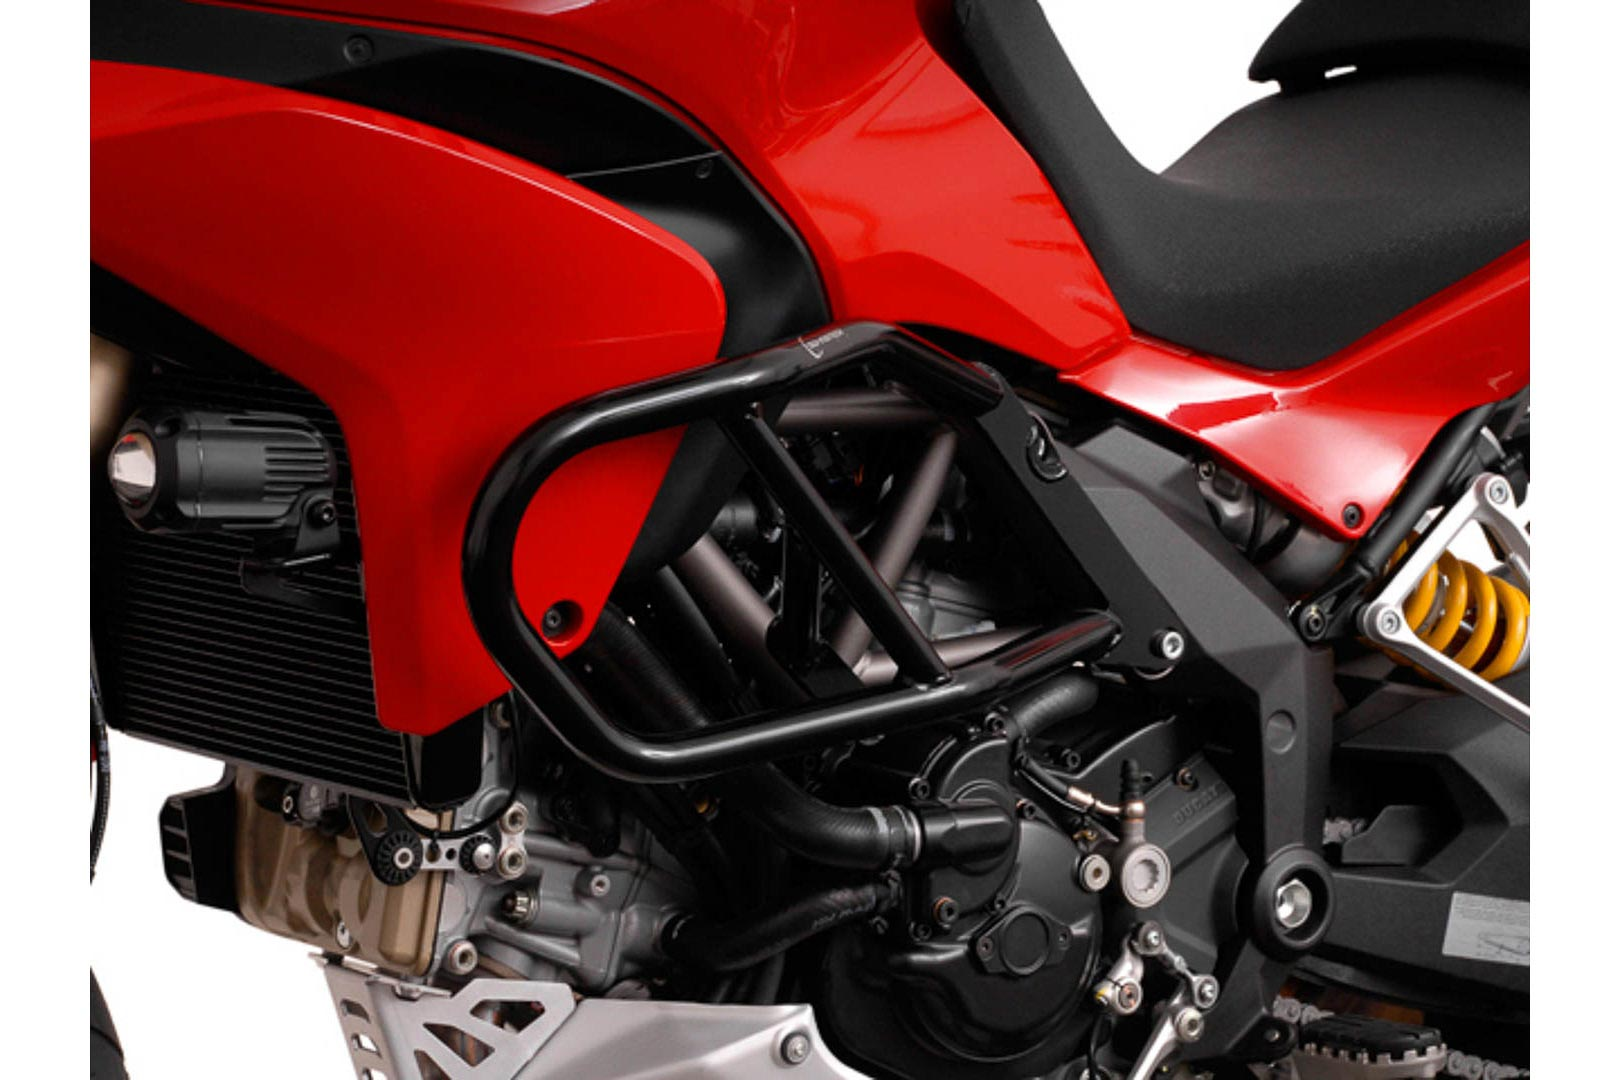 SW-Motech Moottorinsuojarauta Ducati Multistrada 1200 10-, musta